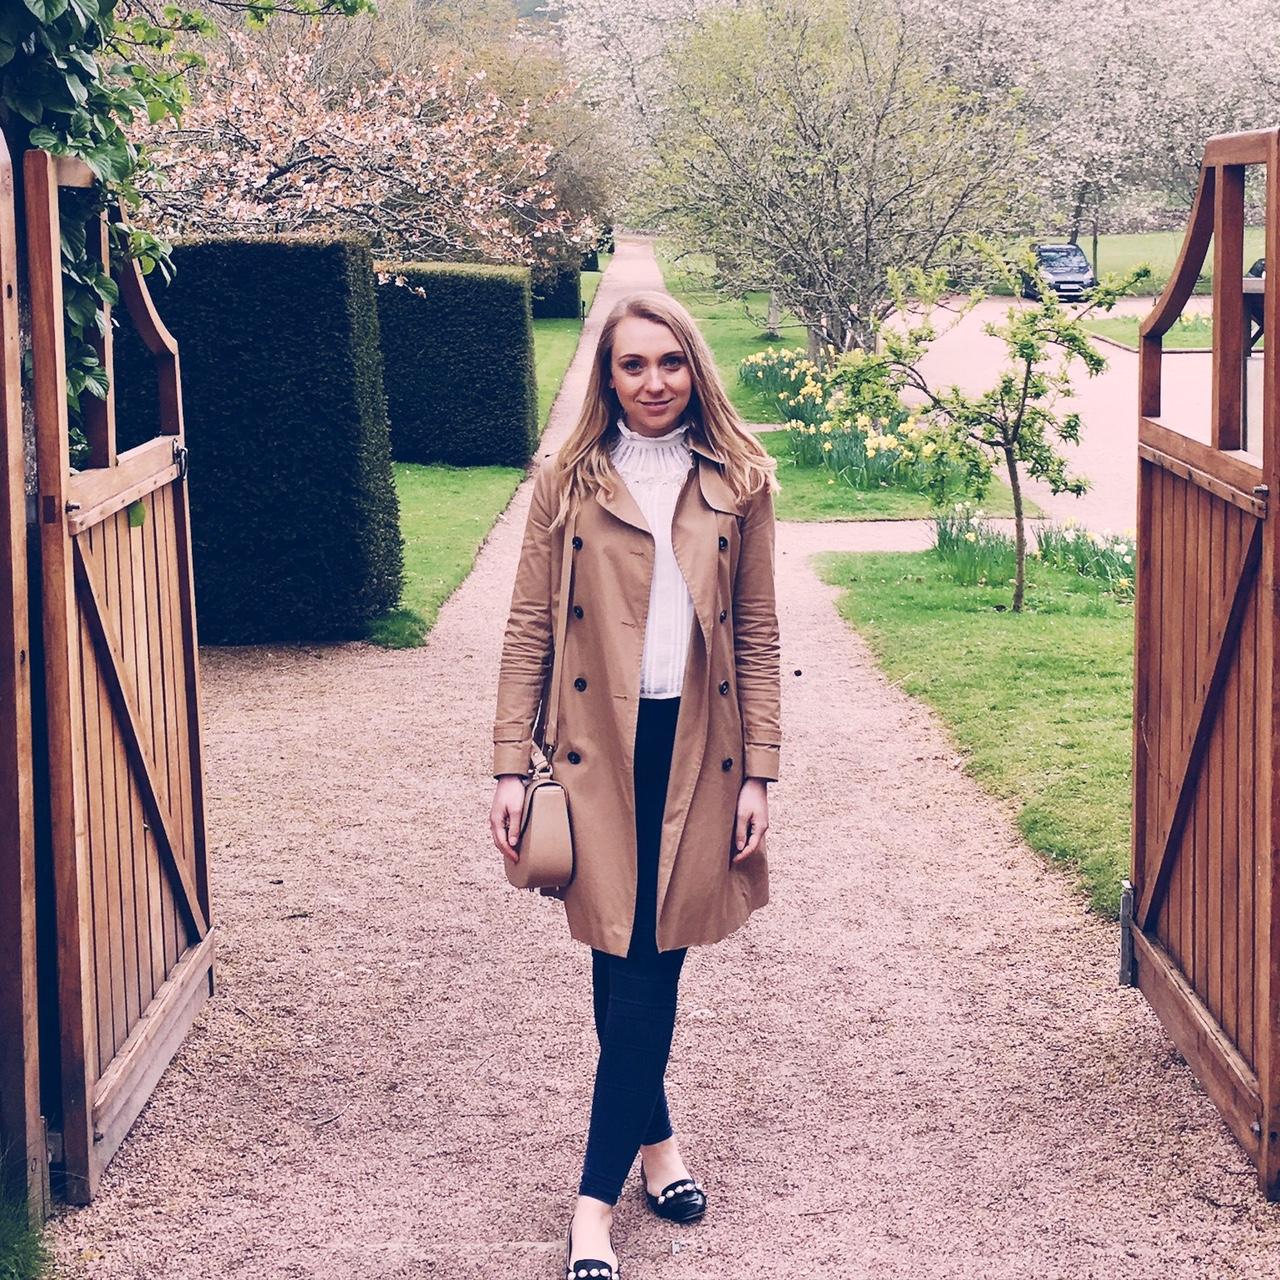 Massimo Dutti Trench Coat  Aspinal of London Saddle Bag   Allsaints Blouse   Topshop Joni Jeans  Topshop Pearl Shoes